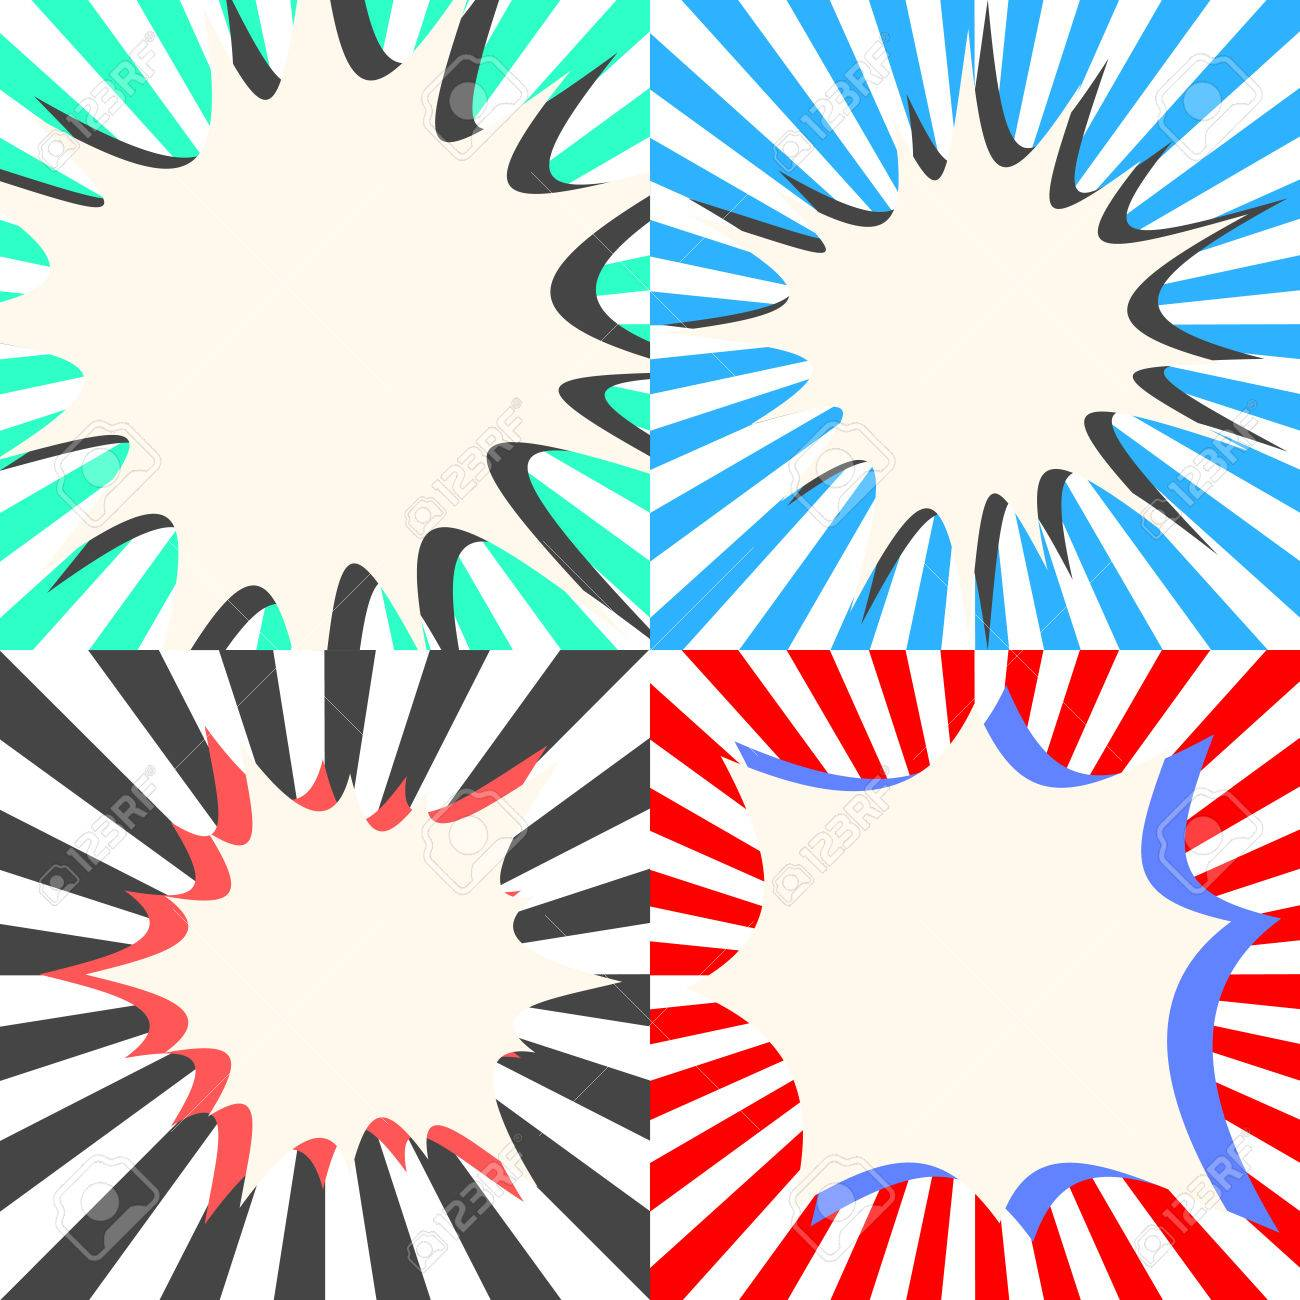 comic book vector bubble effects set sunburst ray background rh 123rf com sunburst vector free download sunburst vector png